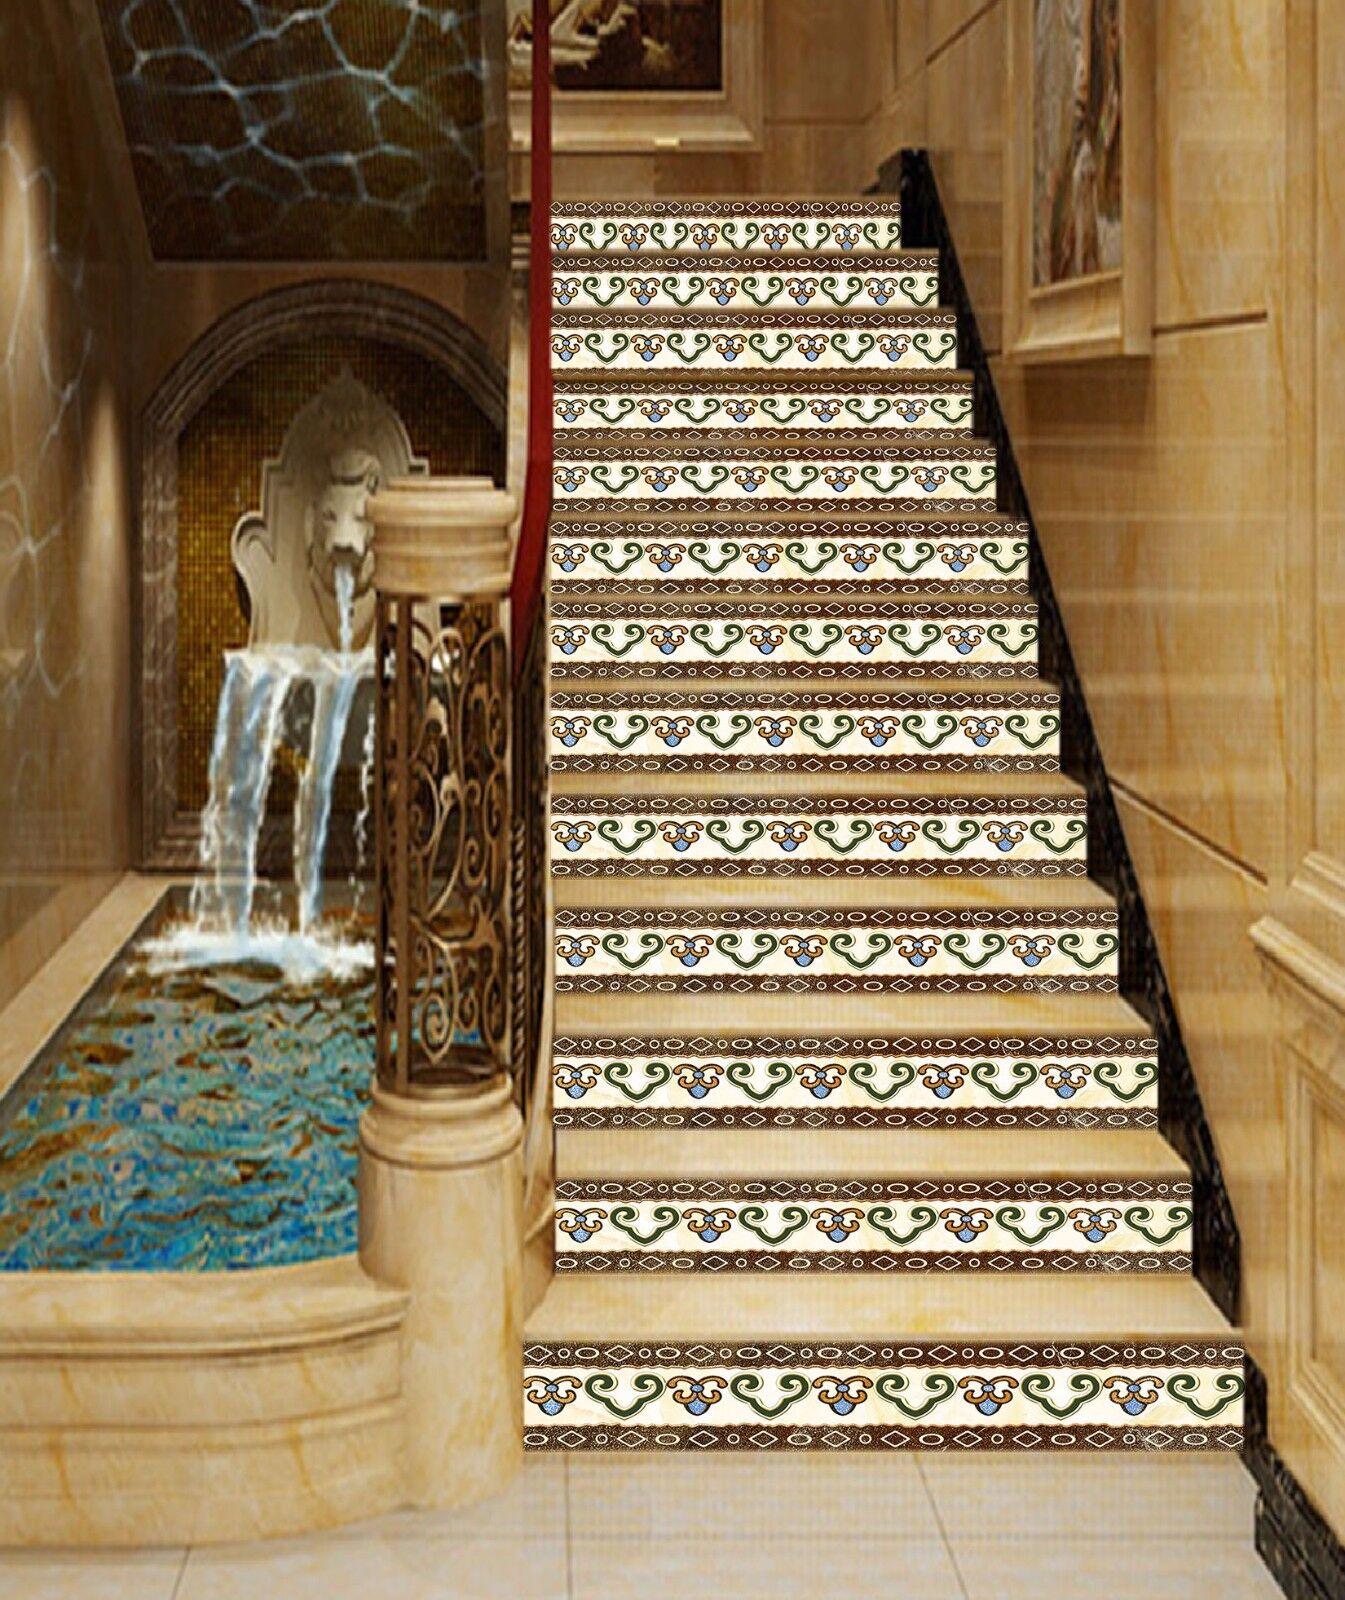 3D Design 62 Stair Risers Decoration Photo Mural Vinyl Decal Wallpaper AU Lemon